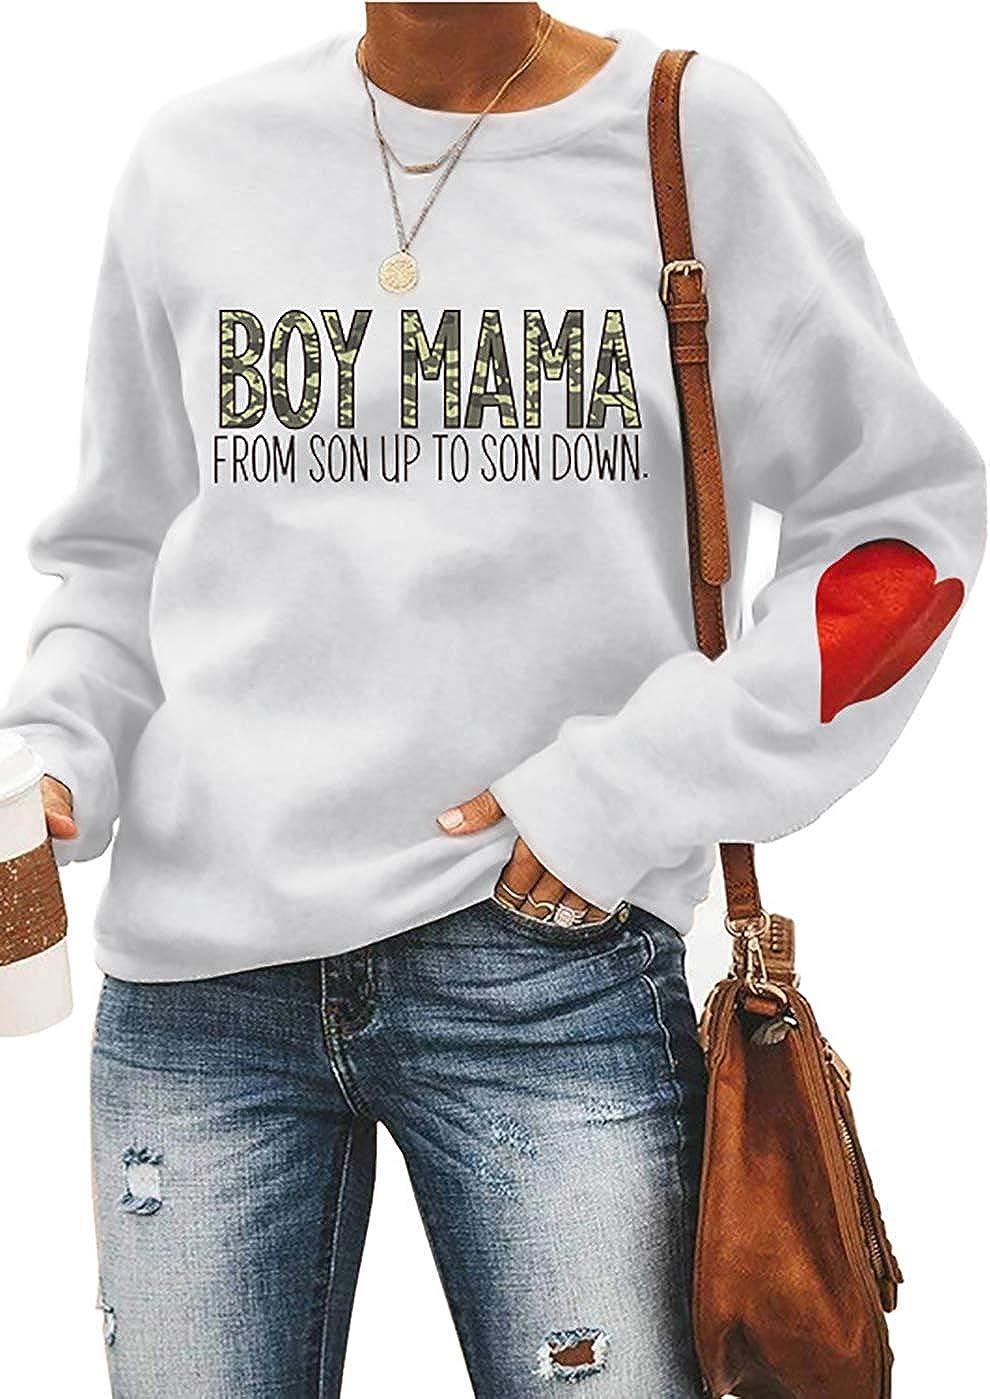 ETATNG Womens Boy Mama Sweatshirt Round Neck Pullover Tshirts Mama Life Letter Print Tops